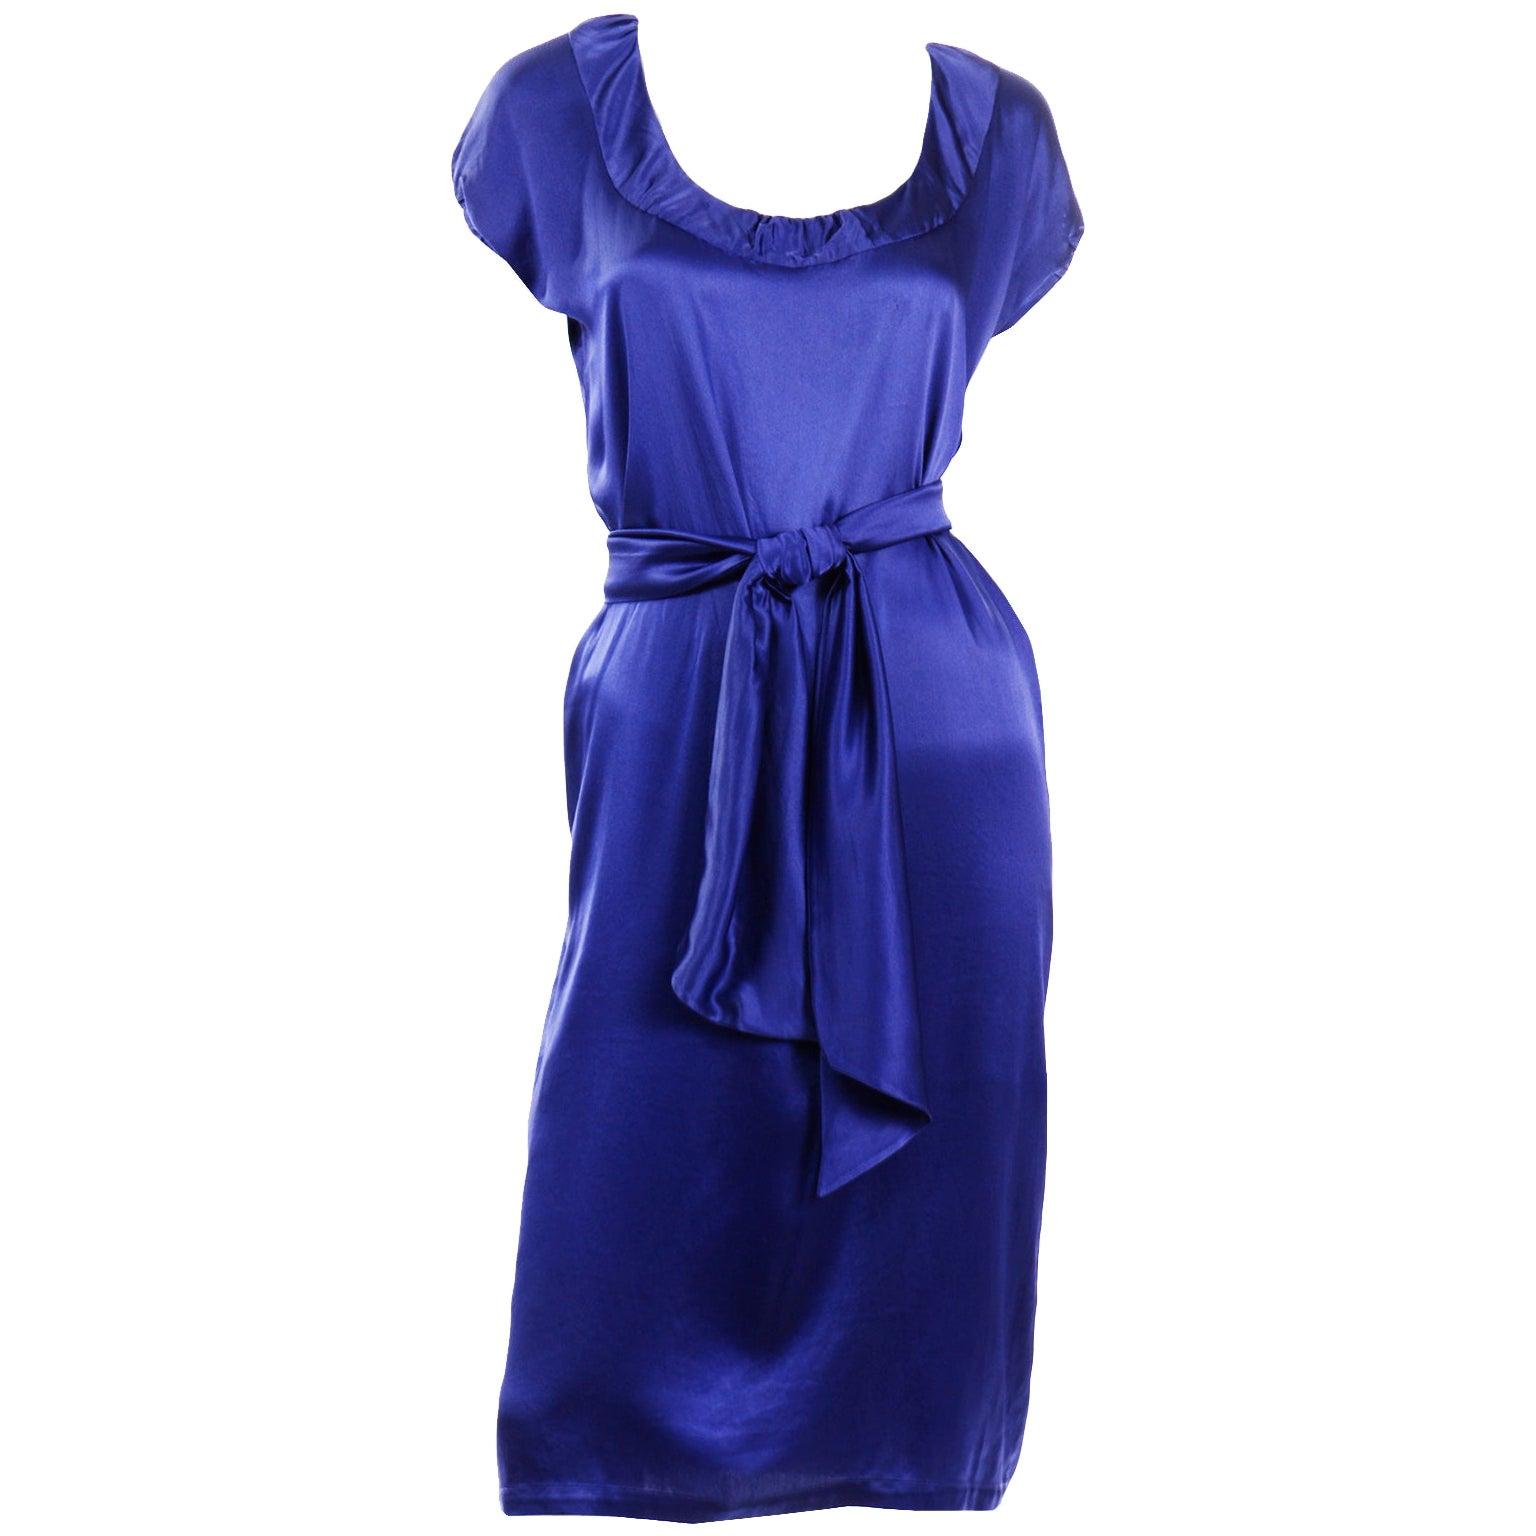 Yves Saint Laurent Blue Silk Charmeuse Evening Dress With Sash Belt